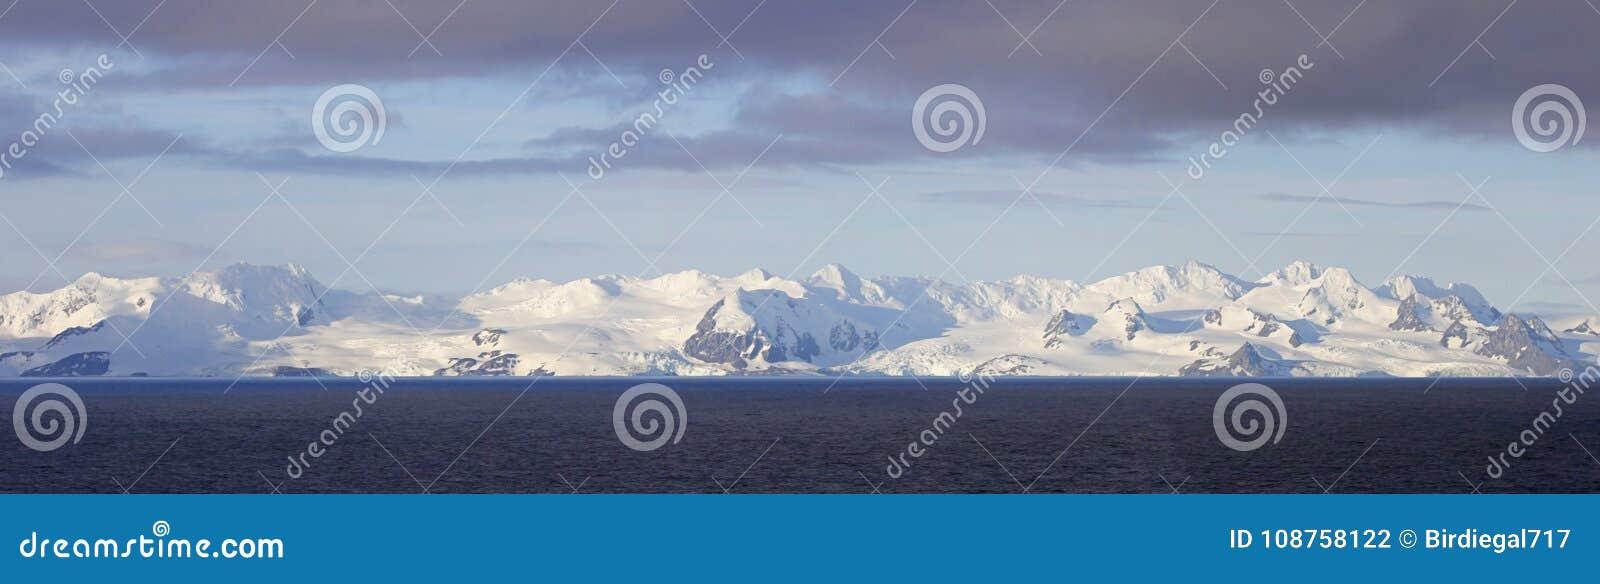 Снег Антарктики покрыл горы, стежок 4 фото панорамный Облака шторма и голубое небо